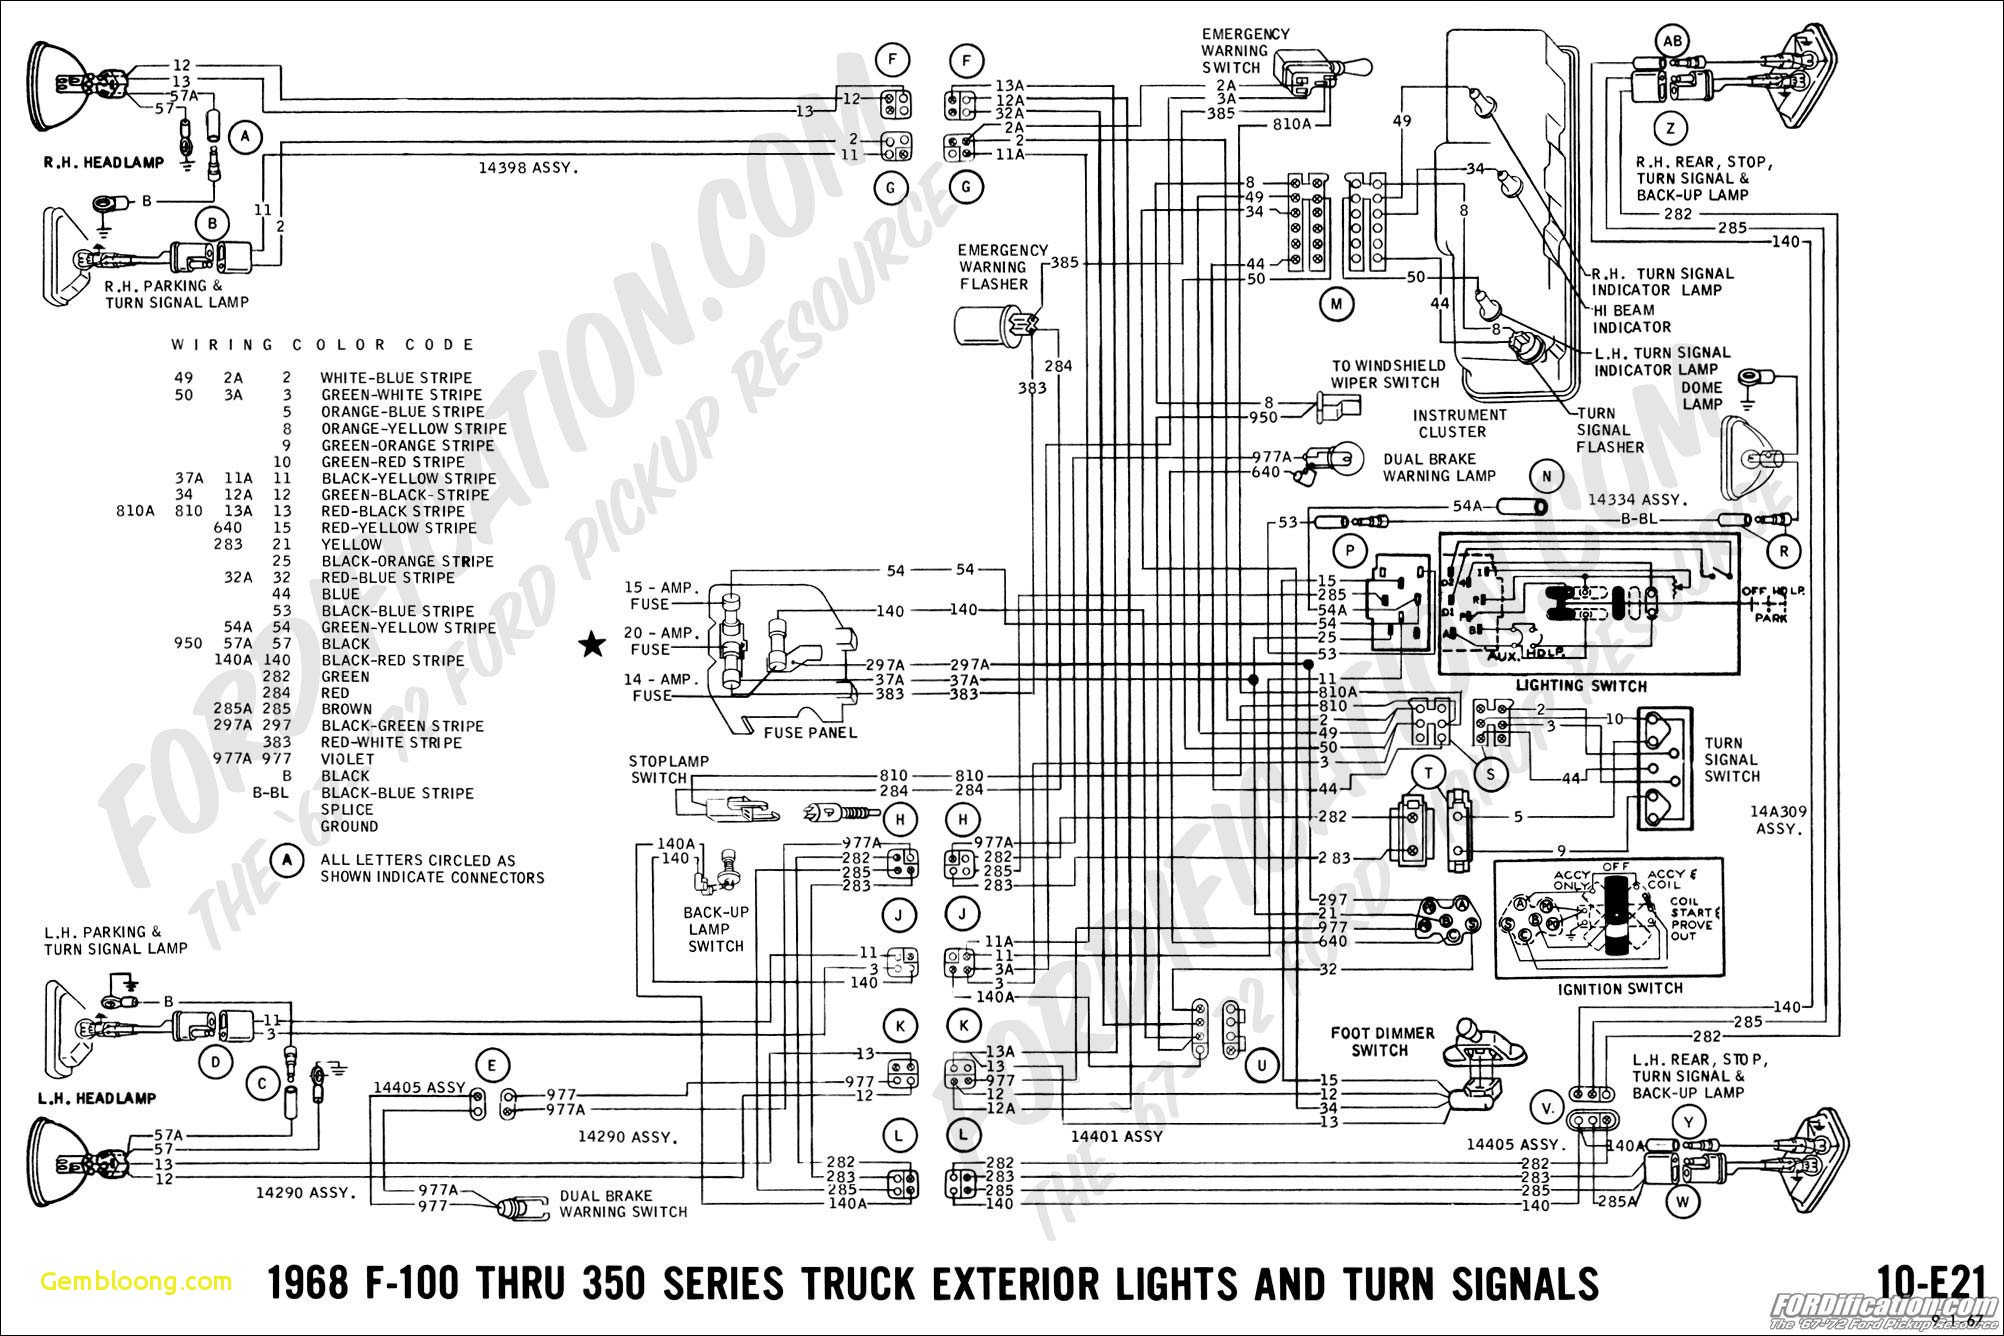 2004 Volvo S40 Engine Diagram Download ford Trucks Wiring Diagrams ford Truck Wiring Diagrams Of 2004 Volvo S40 Engine Diagram